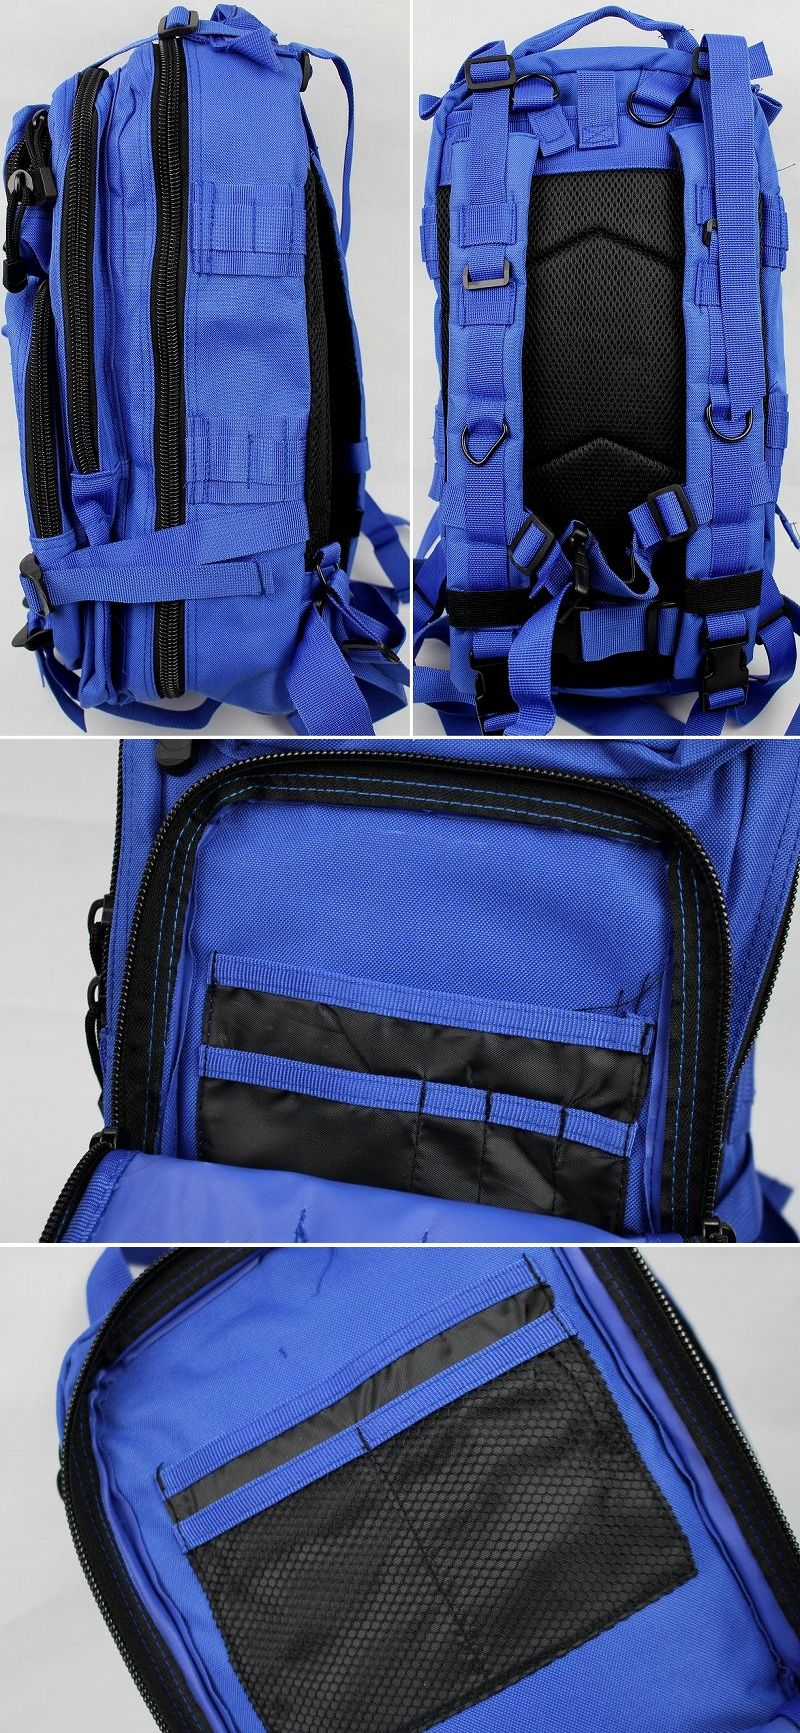 ROTHCO / MEDIUM TRANSPORT PACK / blue